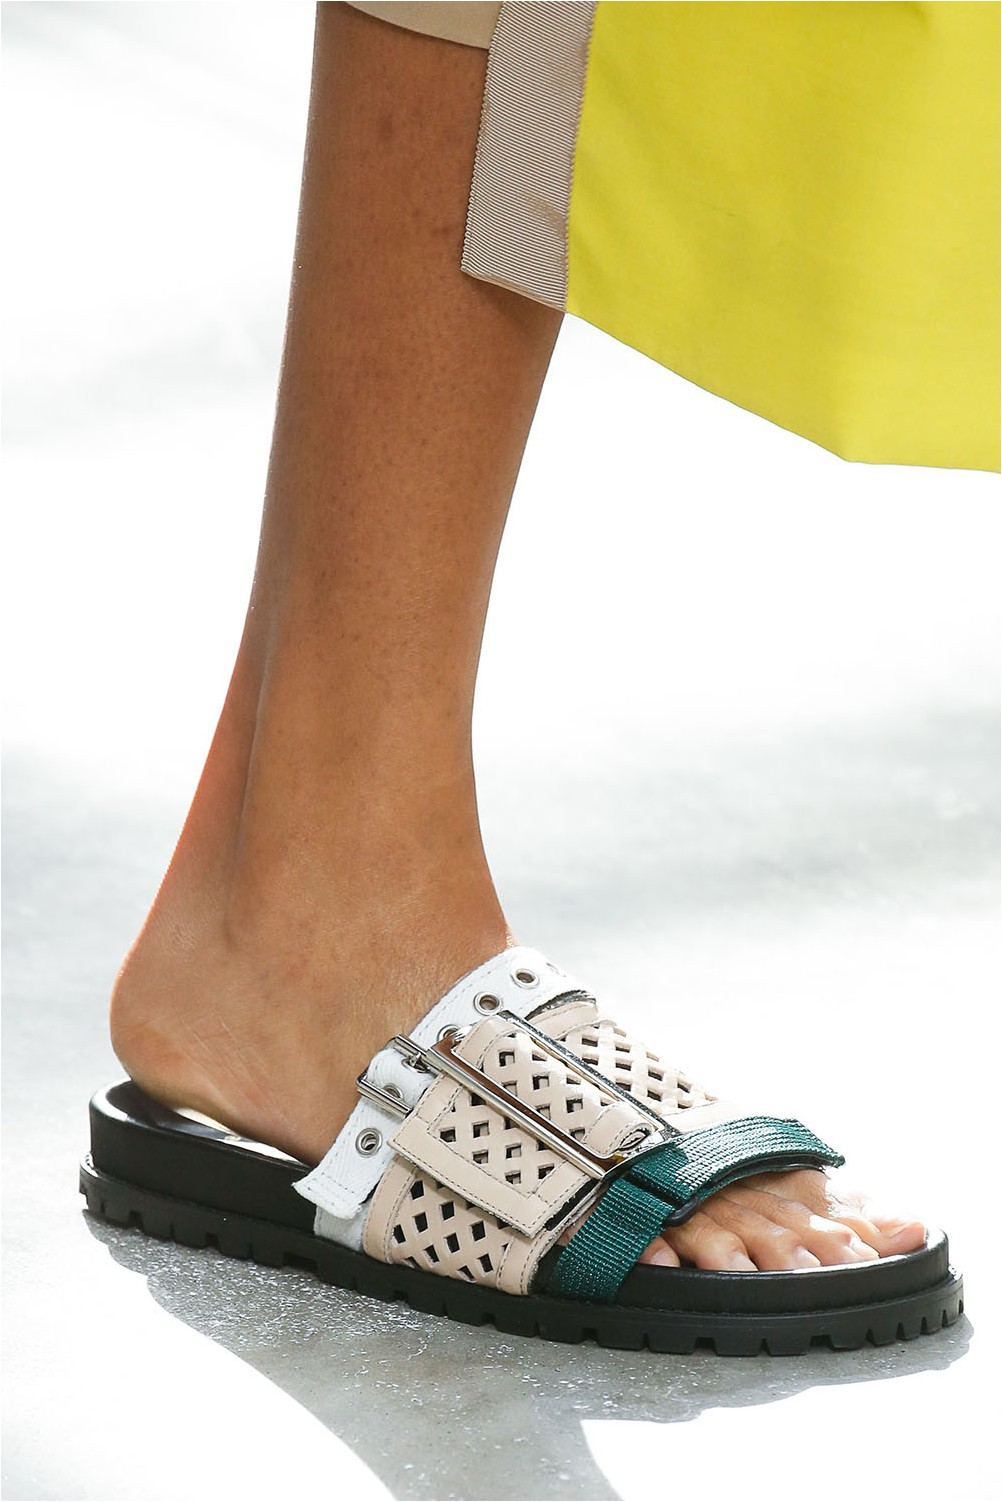 Sacai slippers